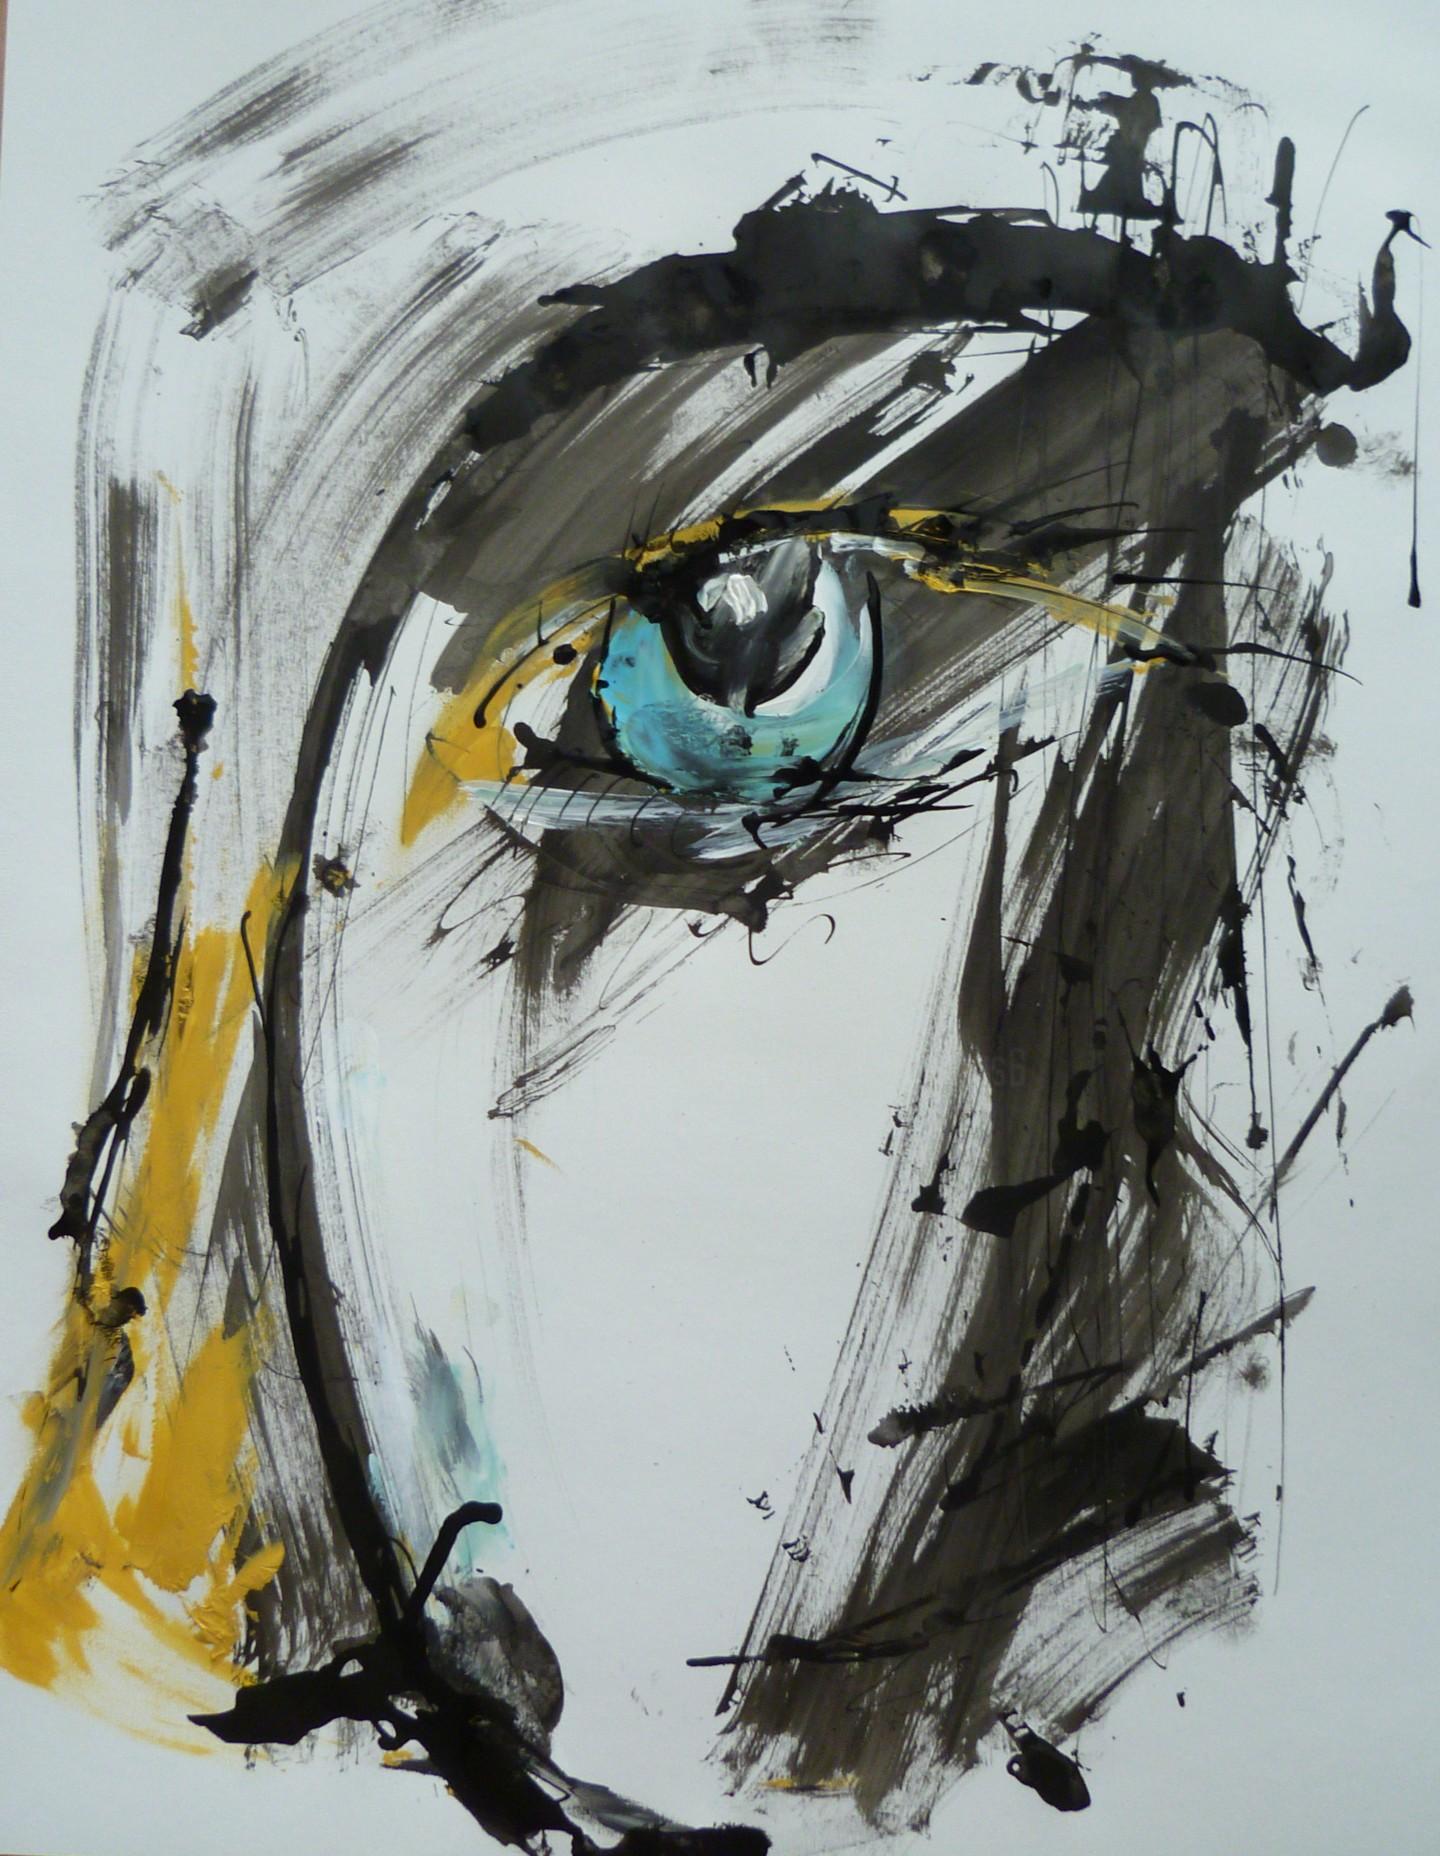 Herve Thomas-Miton - Le regard des autres